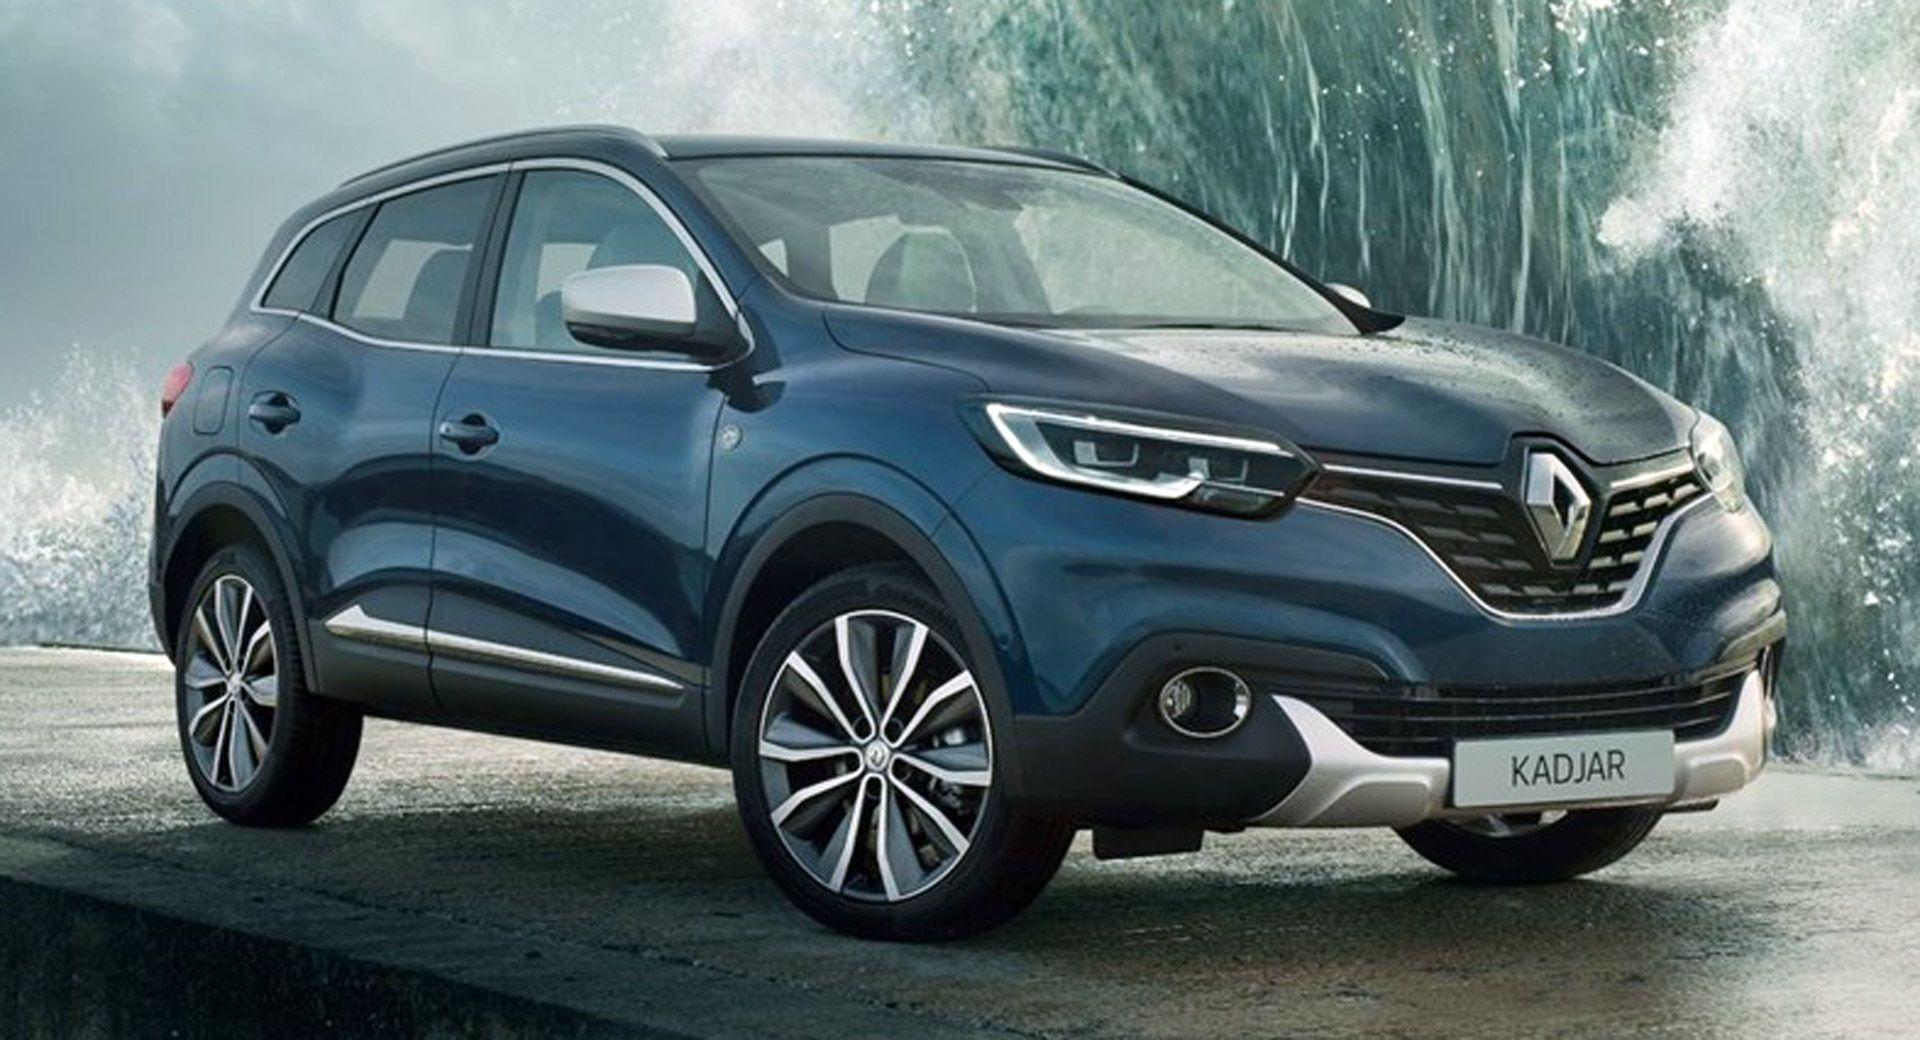 Renault Kadjar Armor Lux Gets A Taste Of Salt Water Carscoops Renault Renault Captur Salt And Water